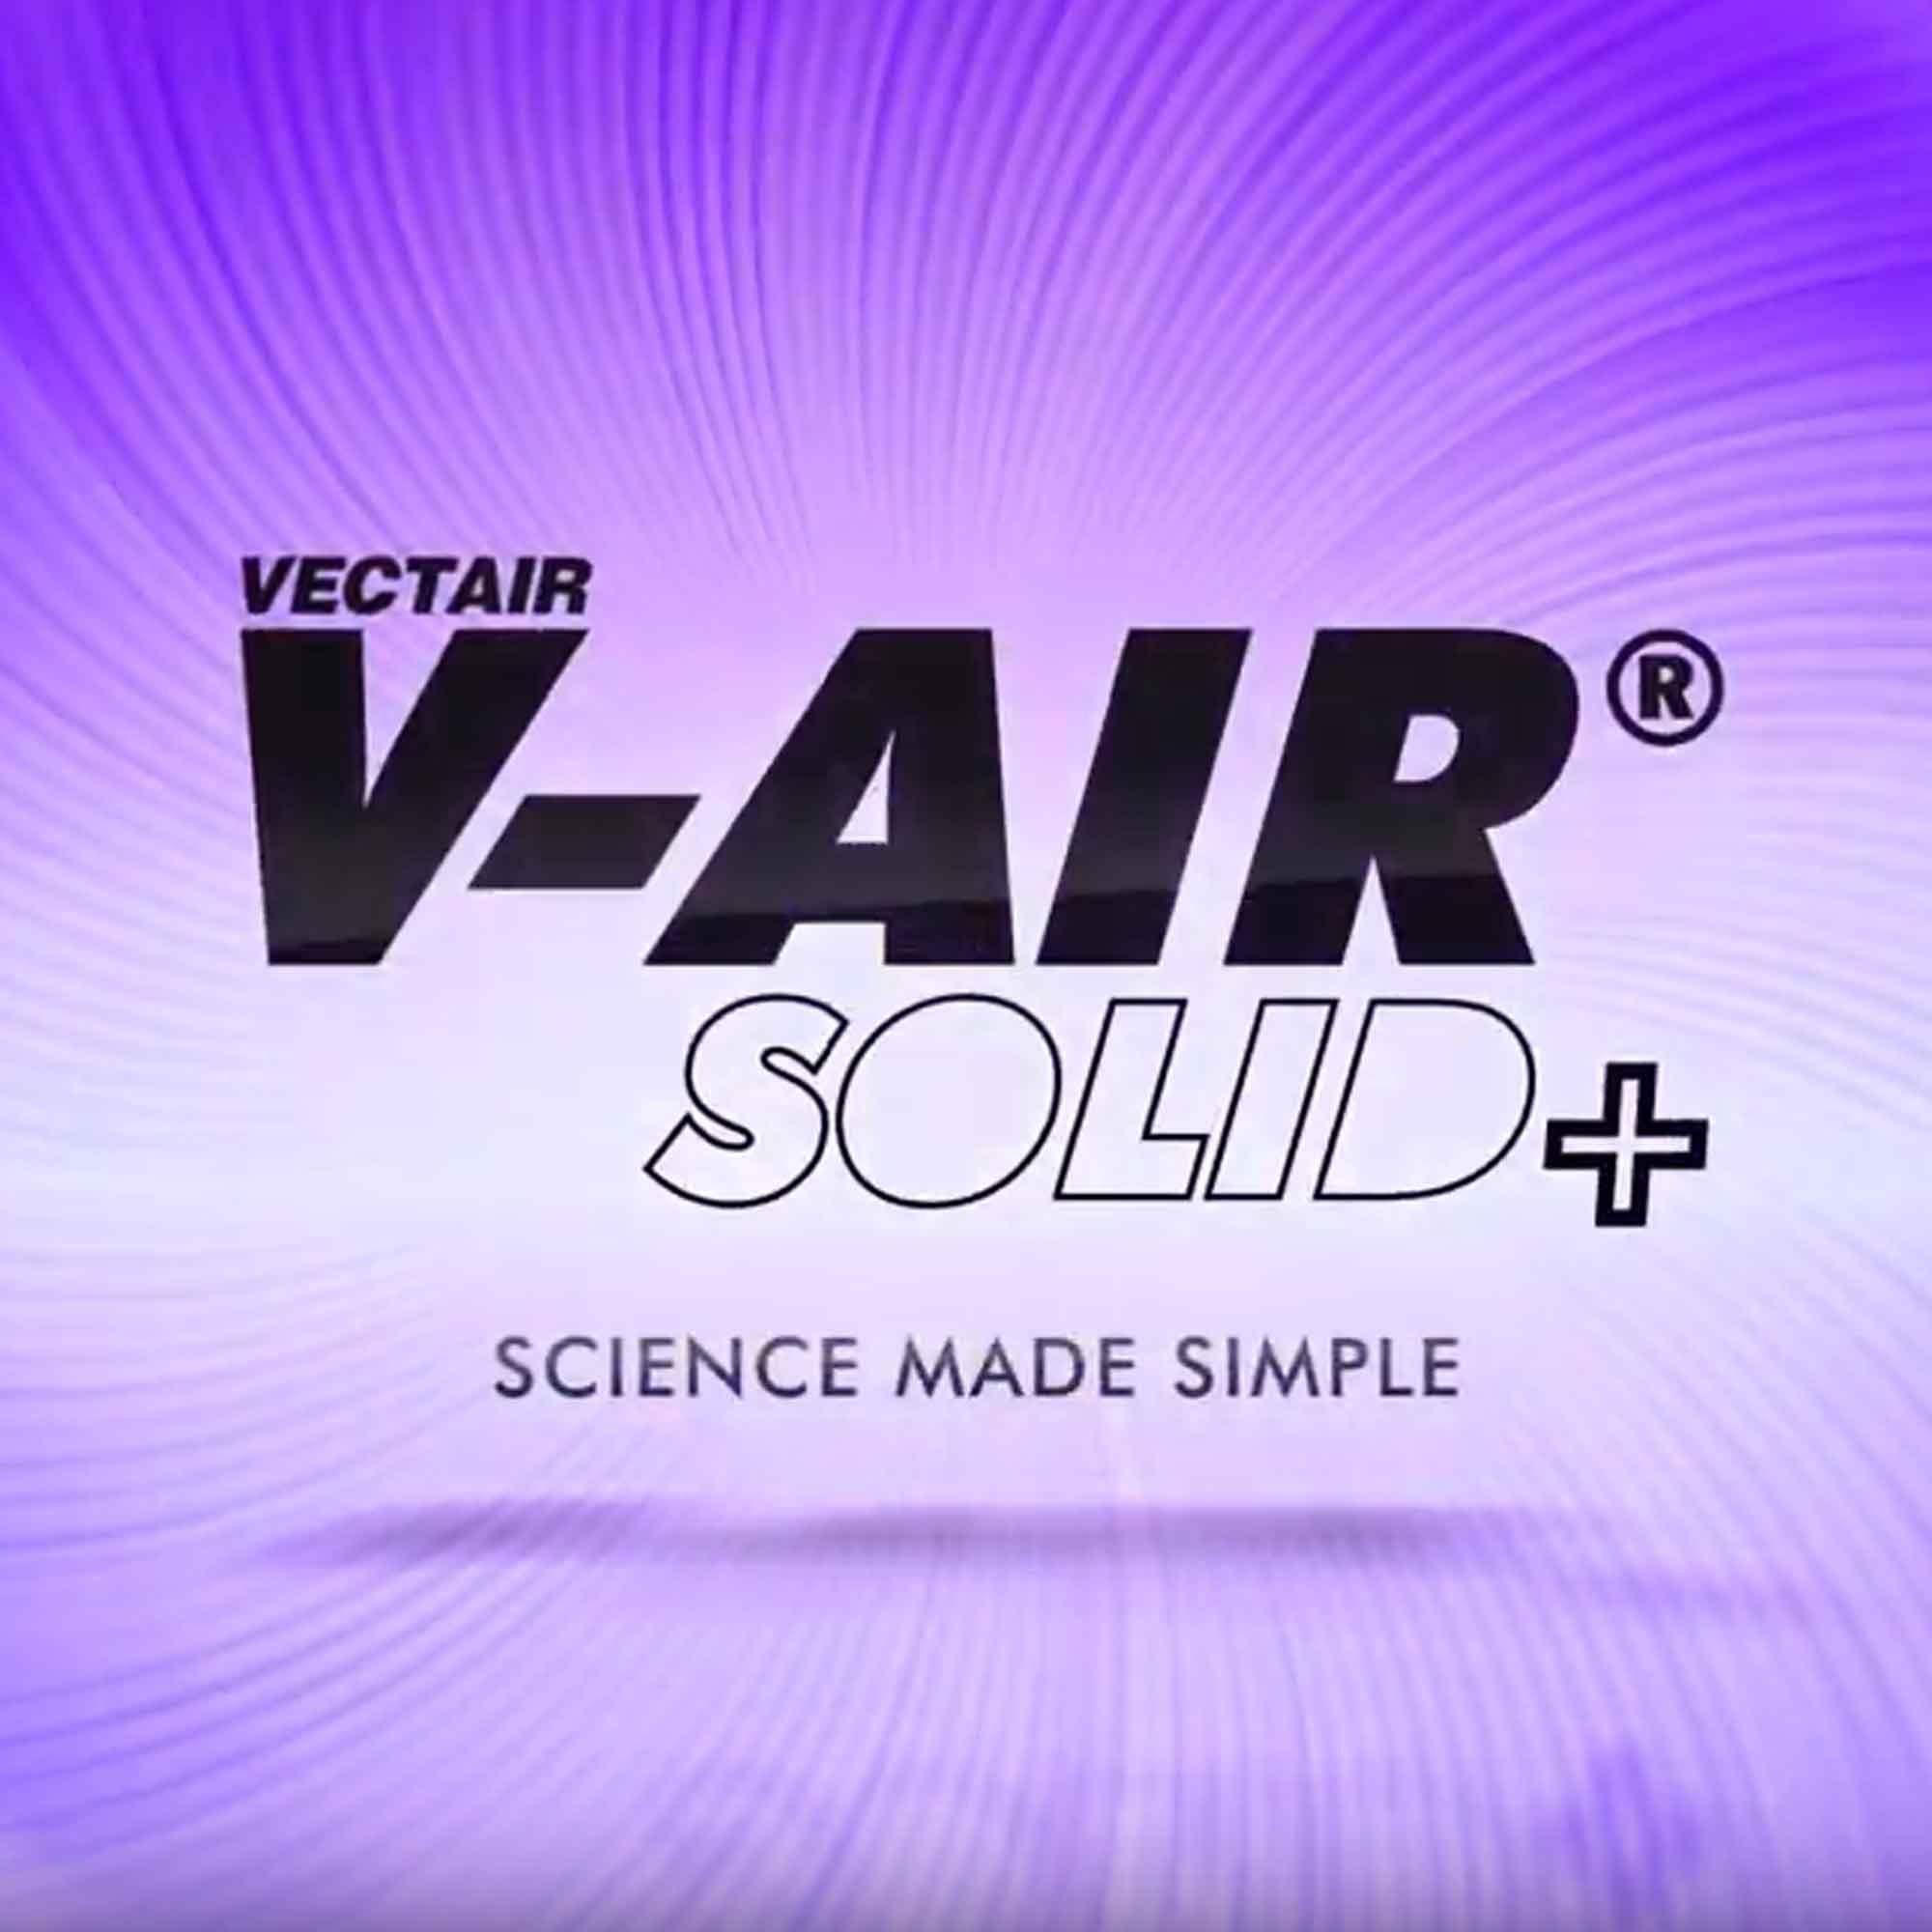 V-Air® SOLID Plus Video Thumbnail